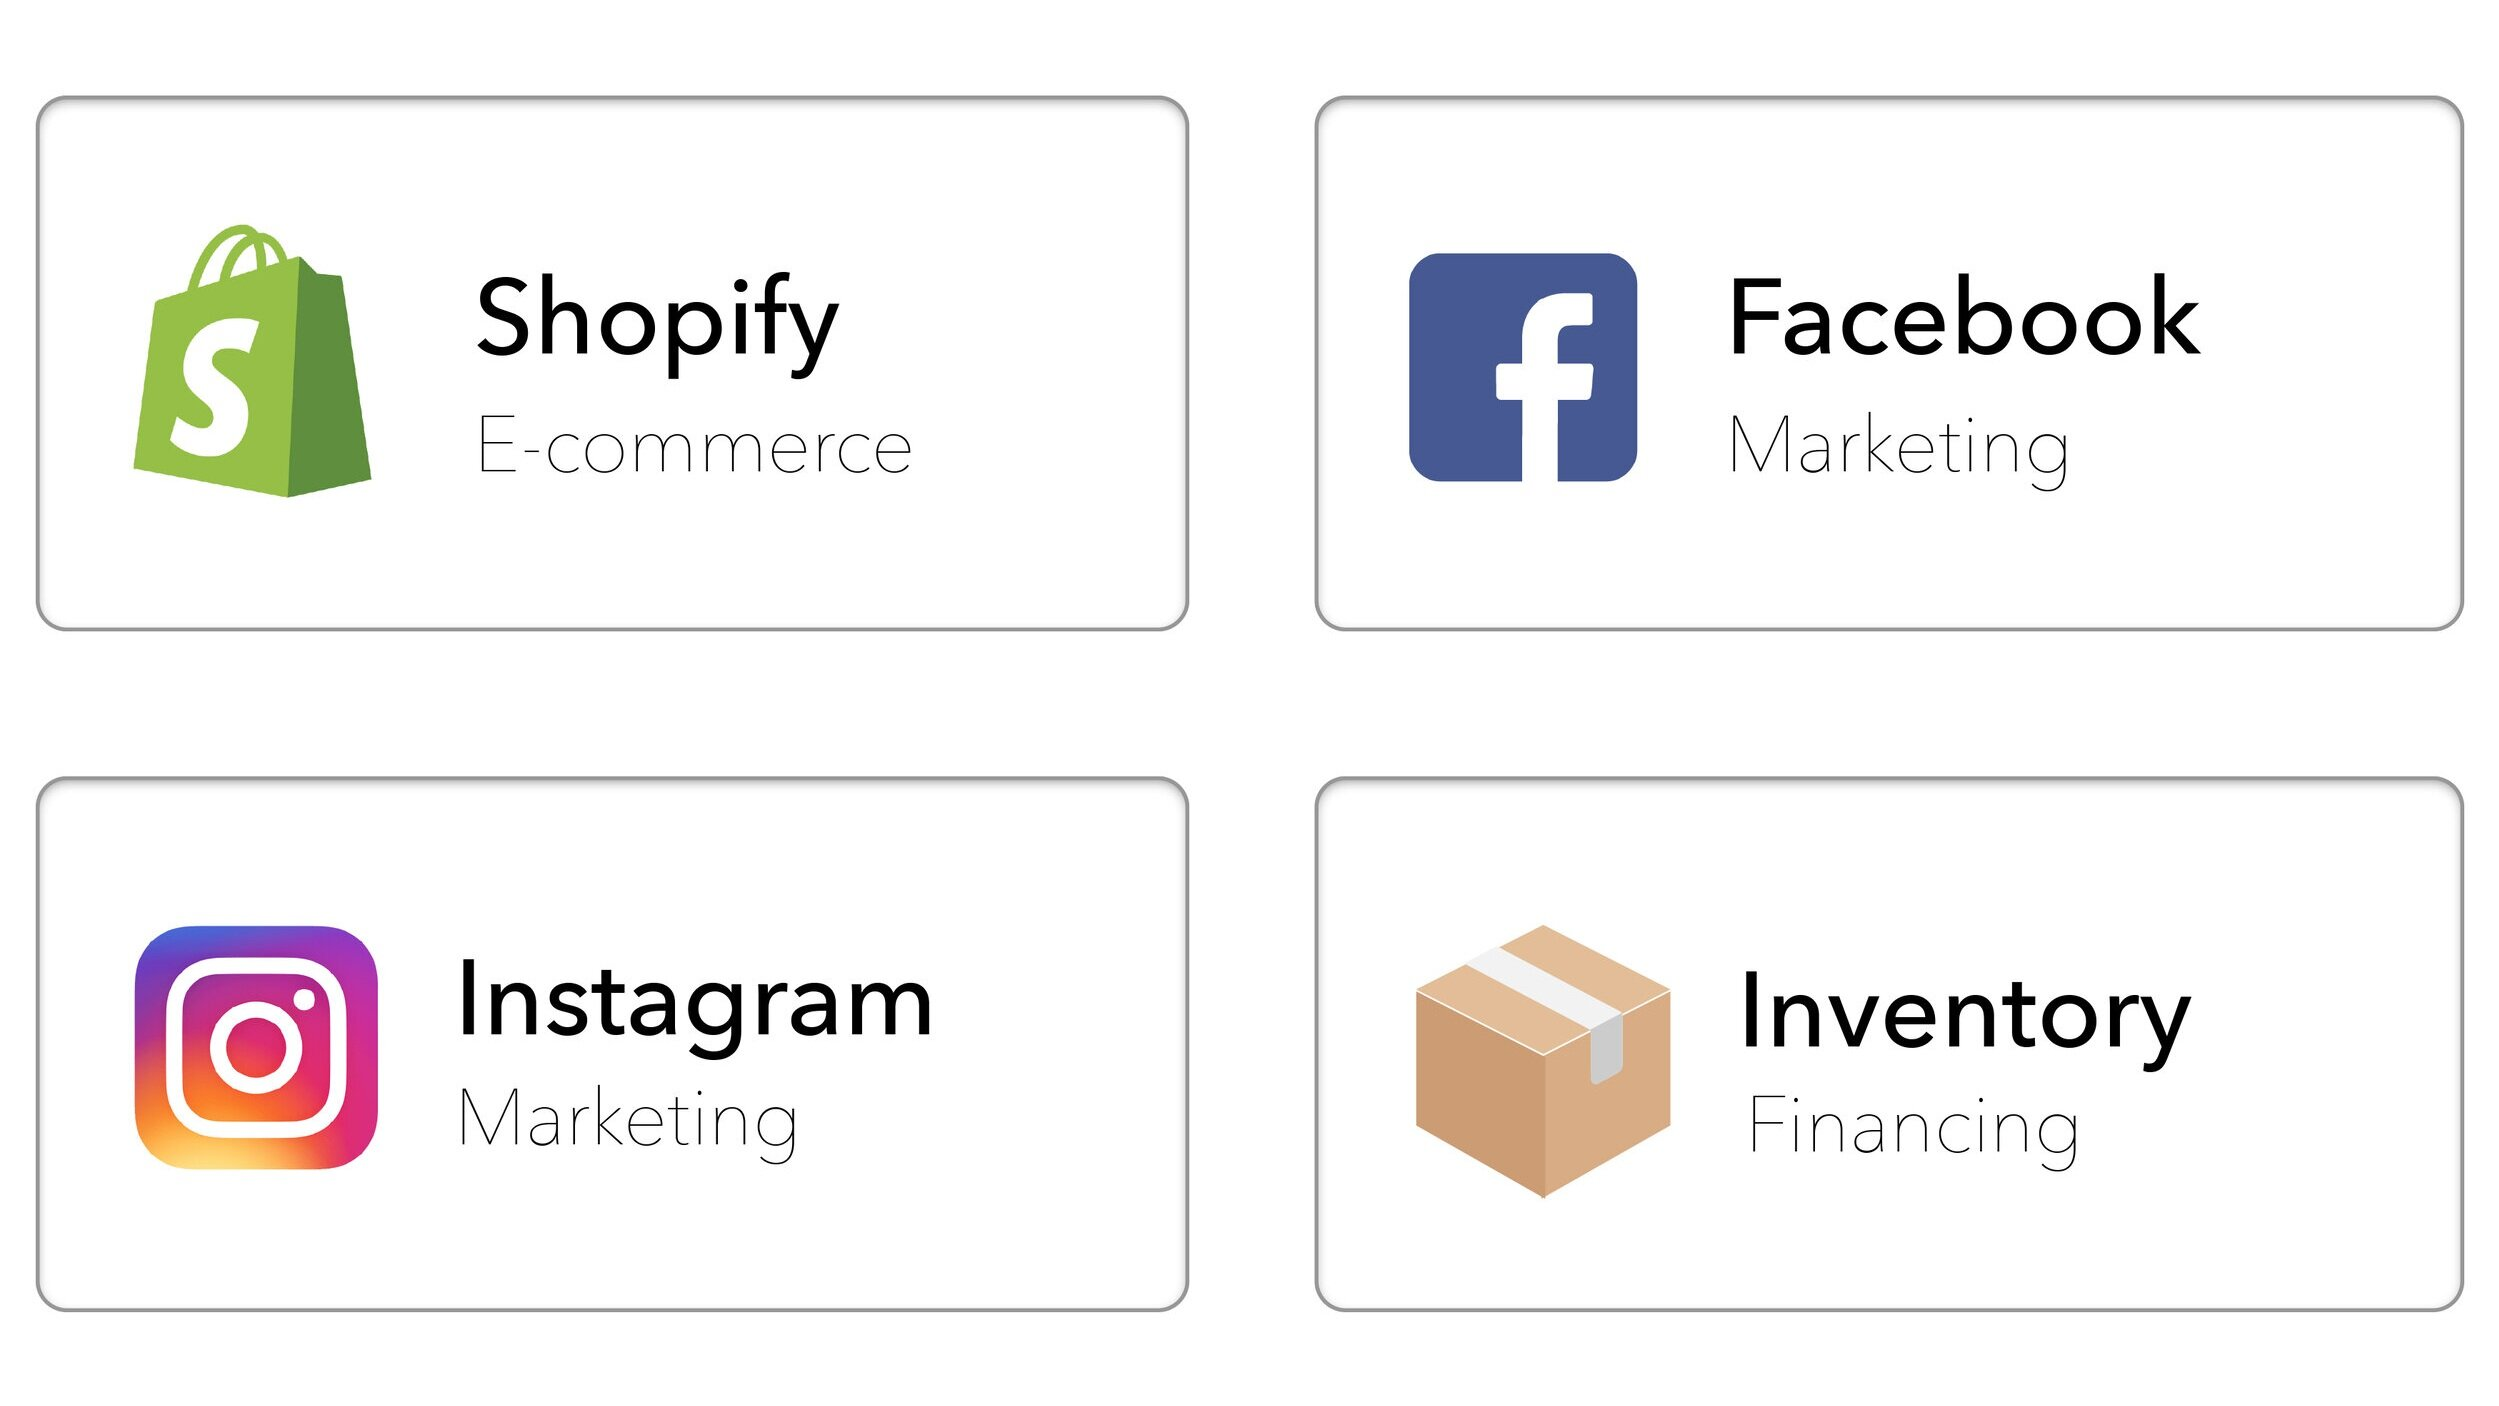 Shopify%2C+Facebook%2C+etc.+copy.jpg